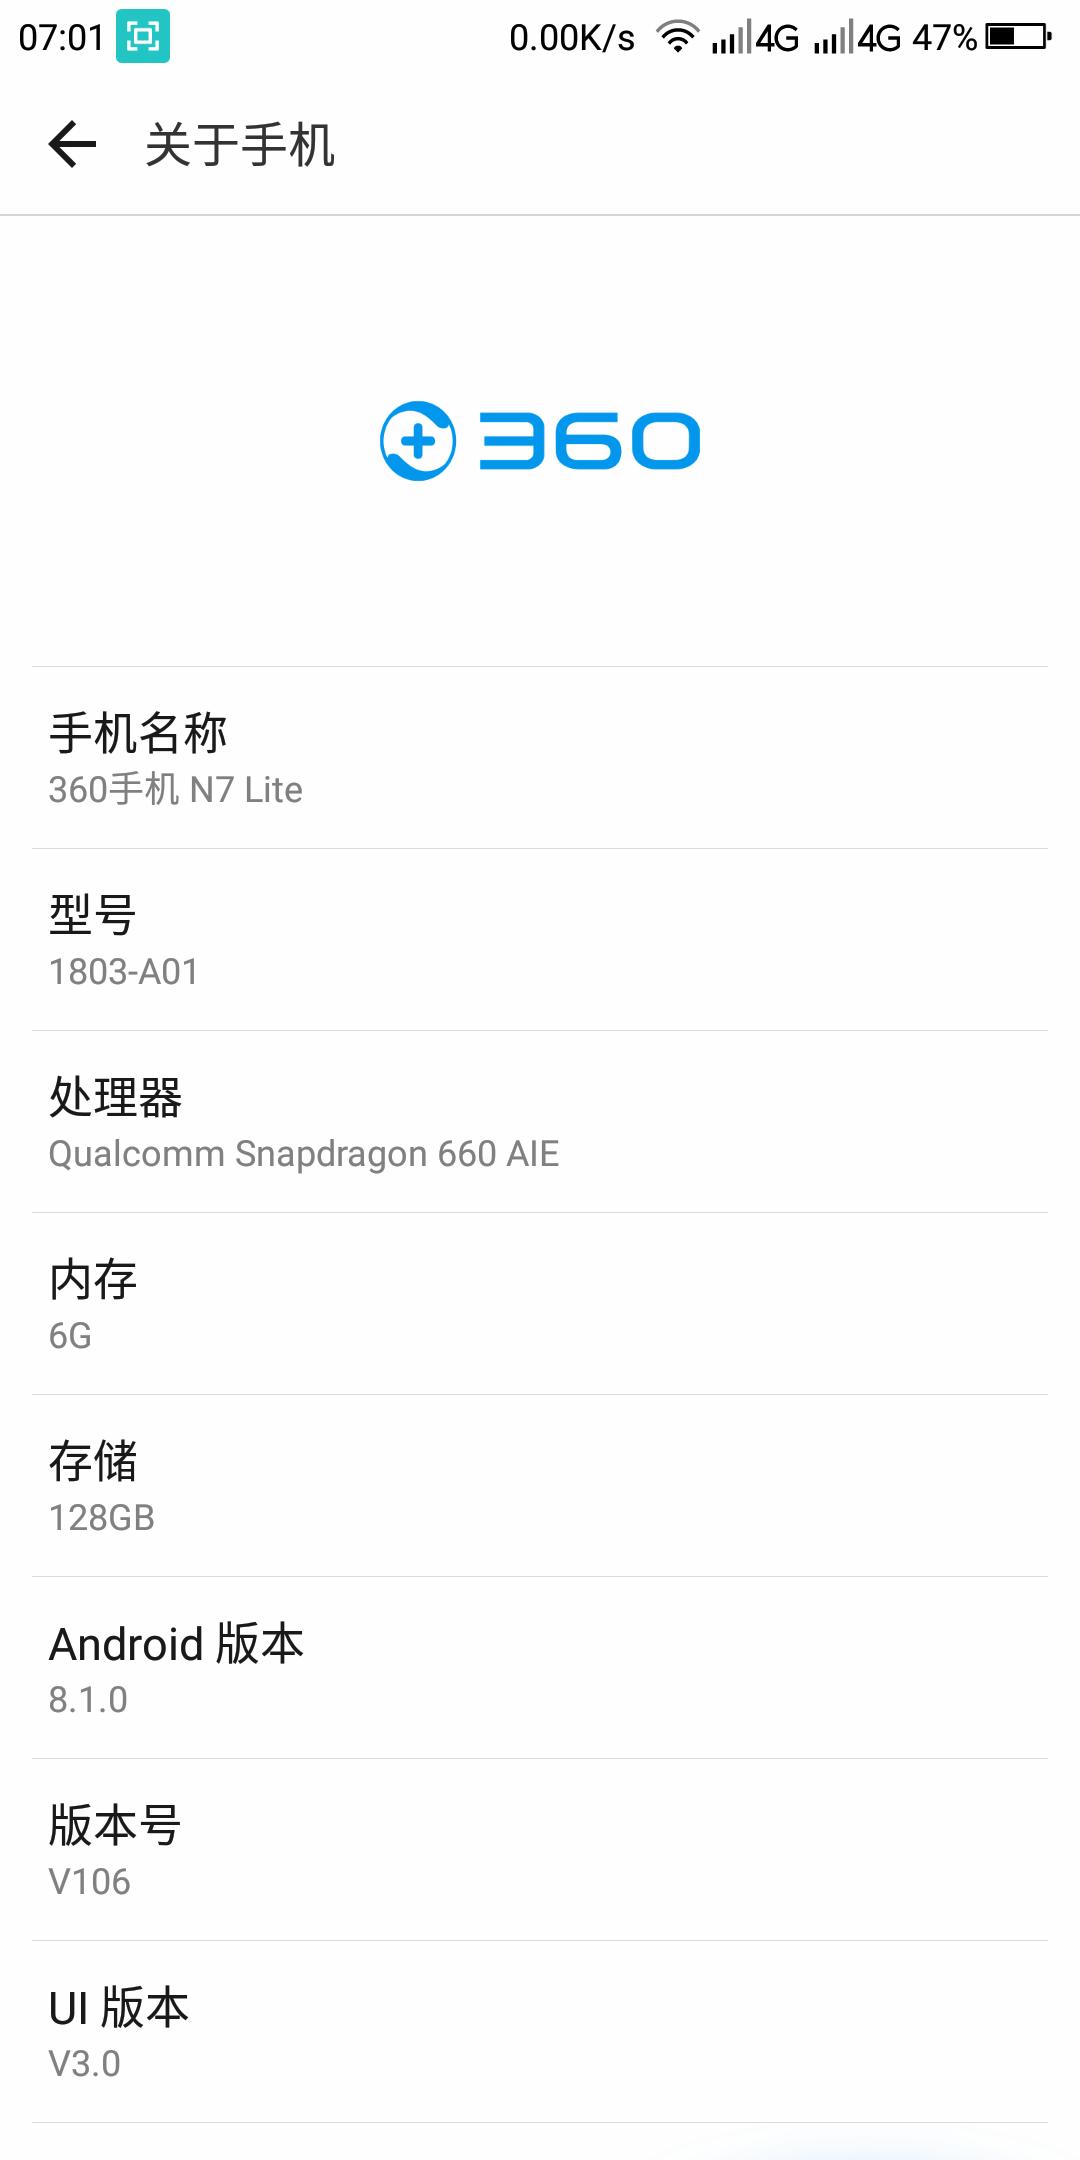 Screenshot_2018-10-10-07-01-45.png